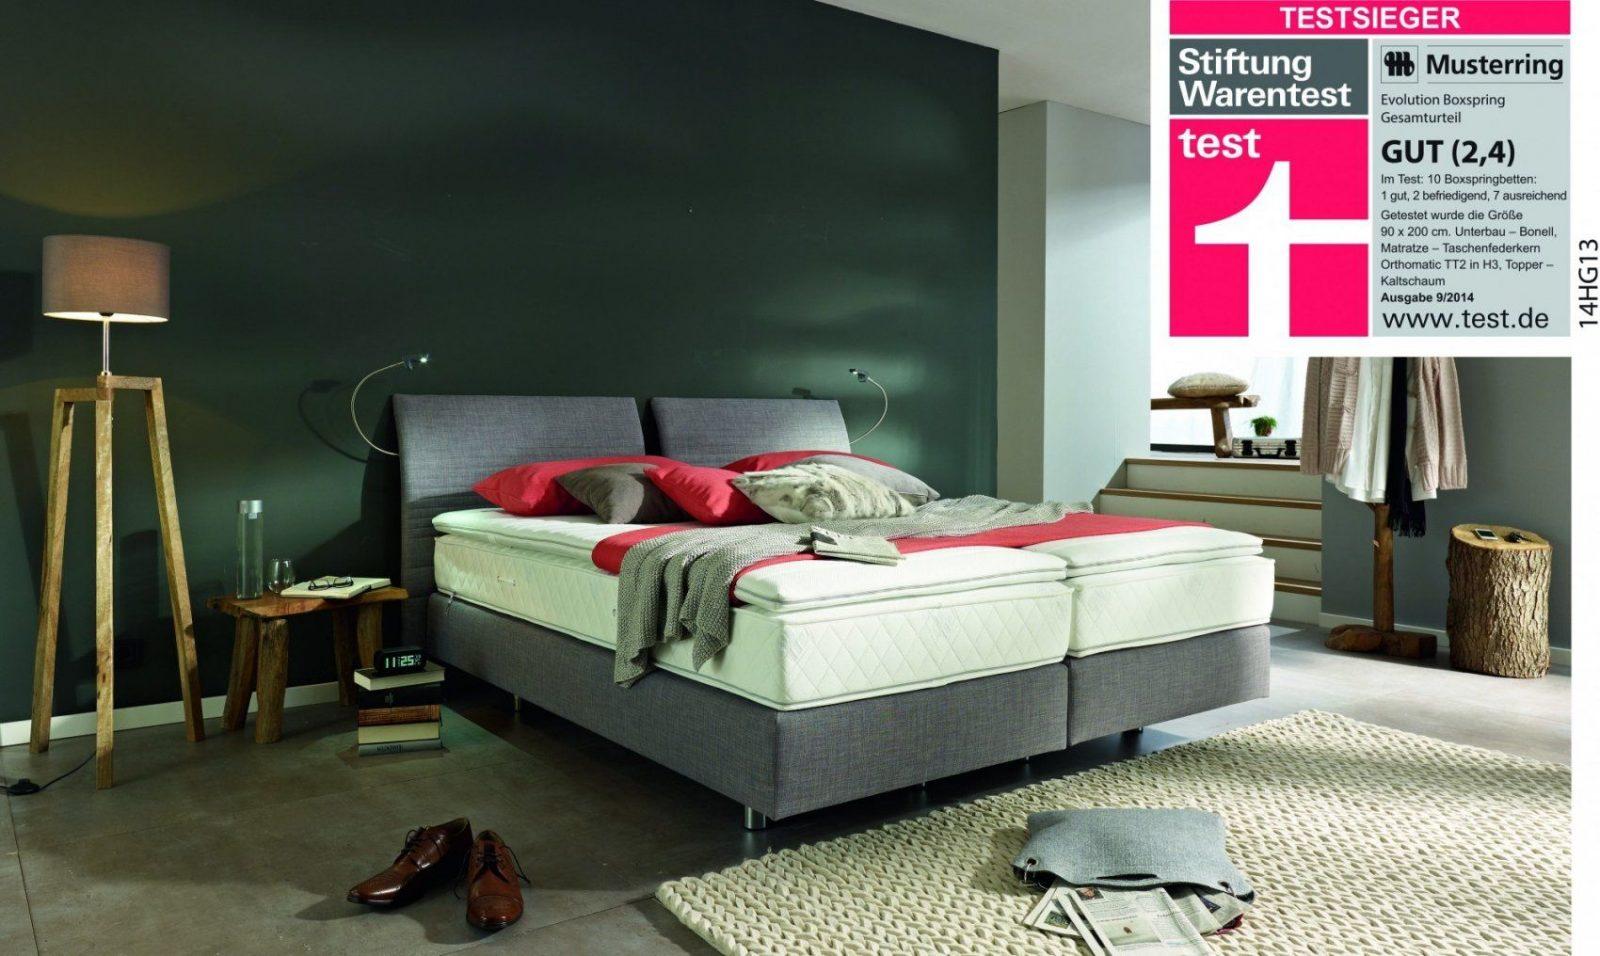 boxspringbett testsieger stiftung warentest haus design. Black Bedroom Furniture Sets. Home Design Ideas